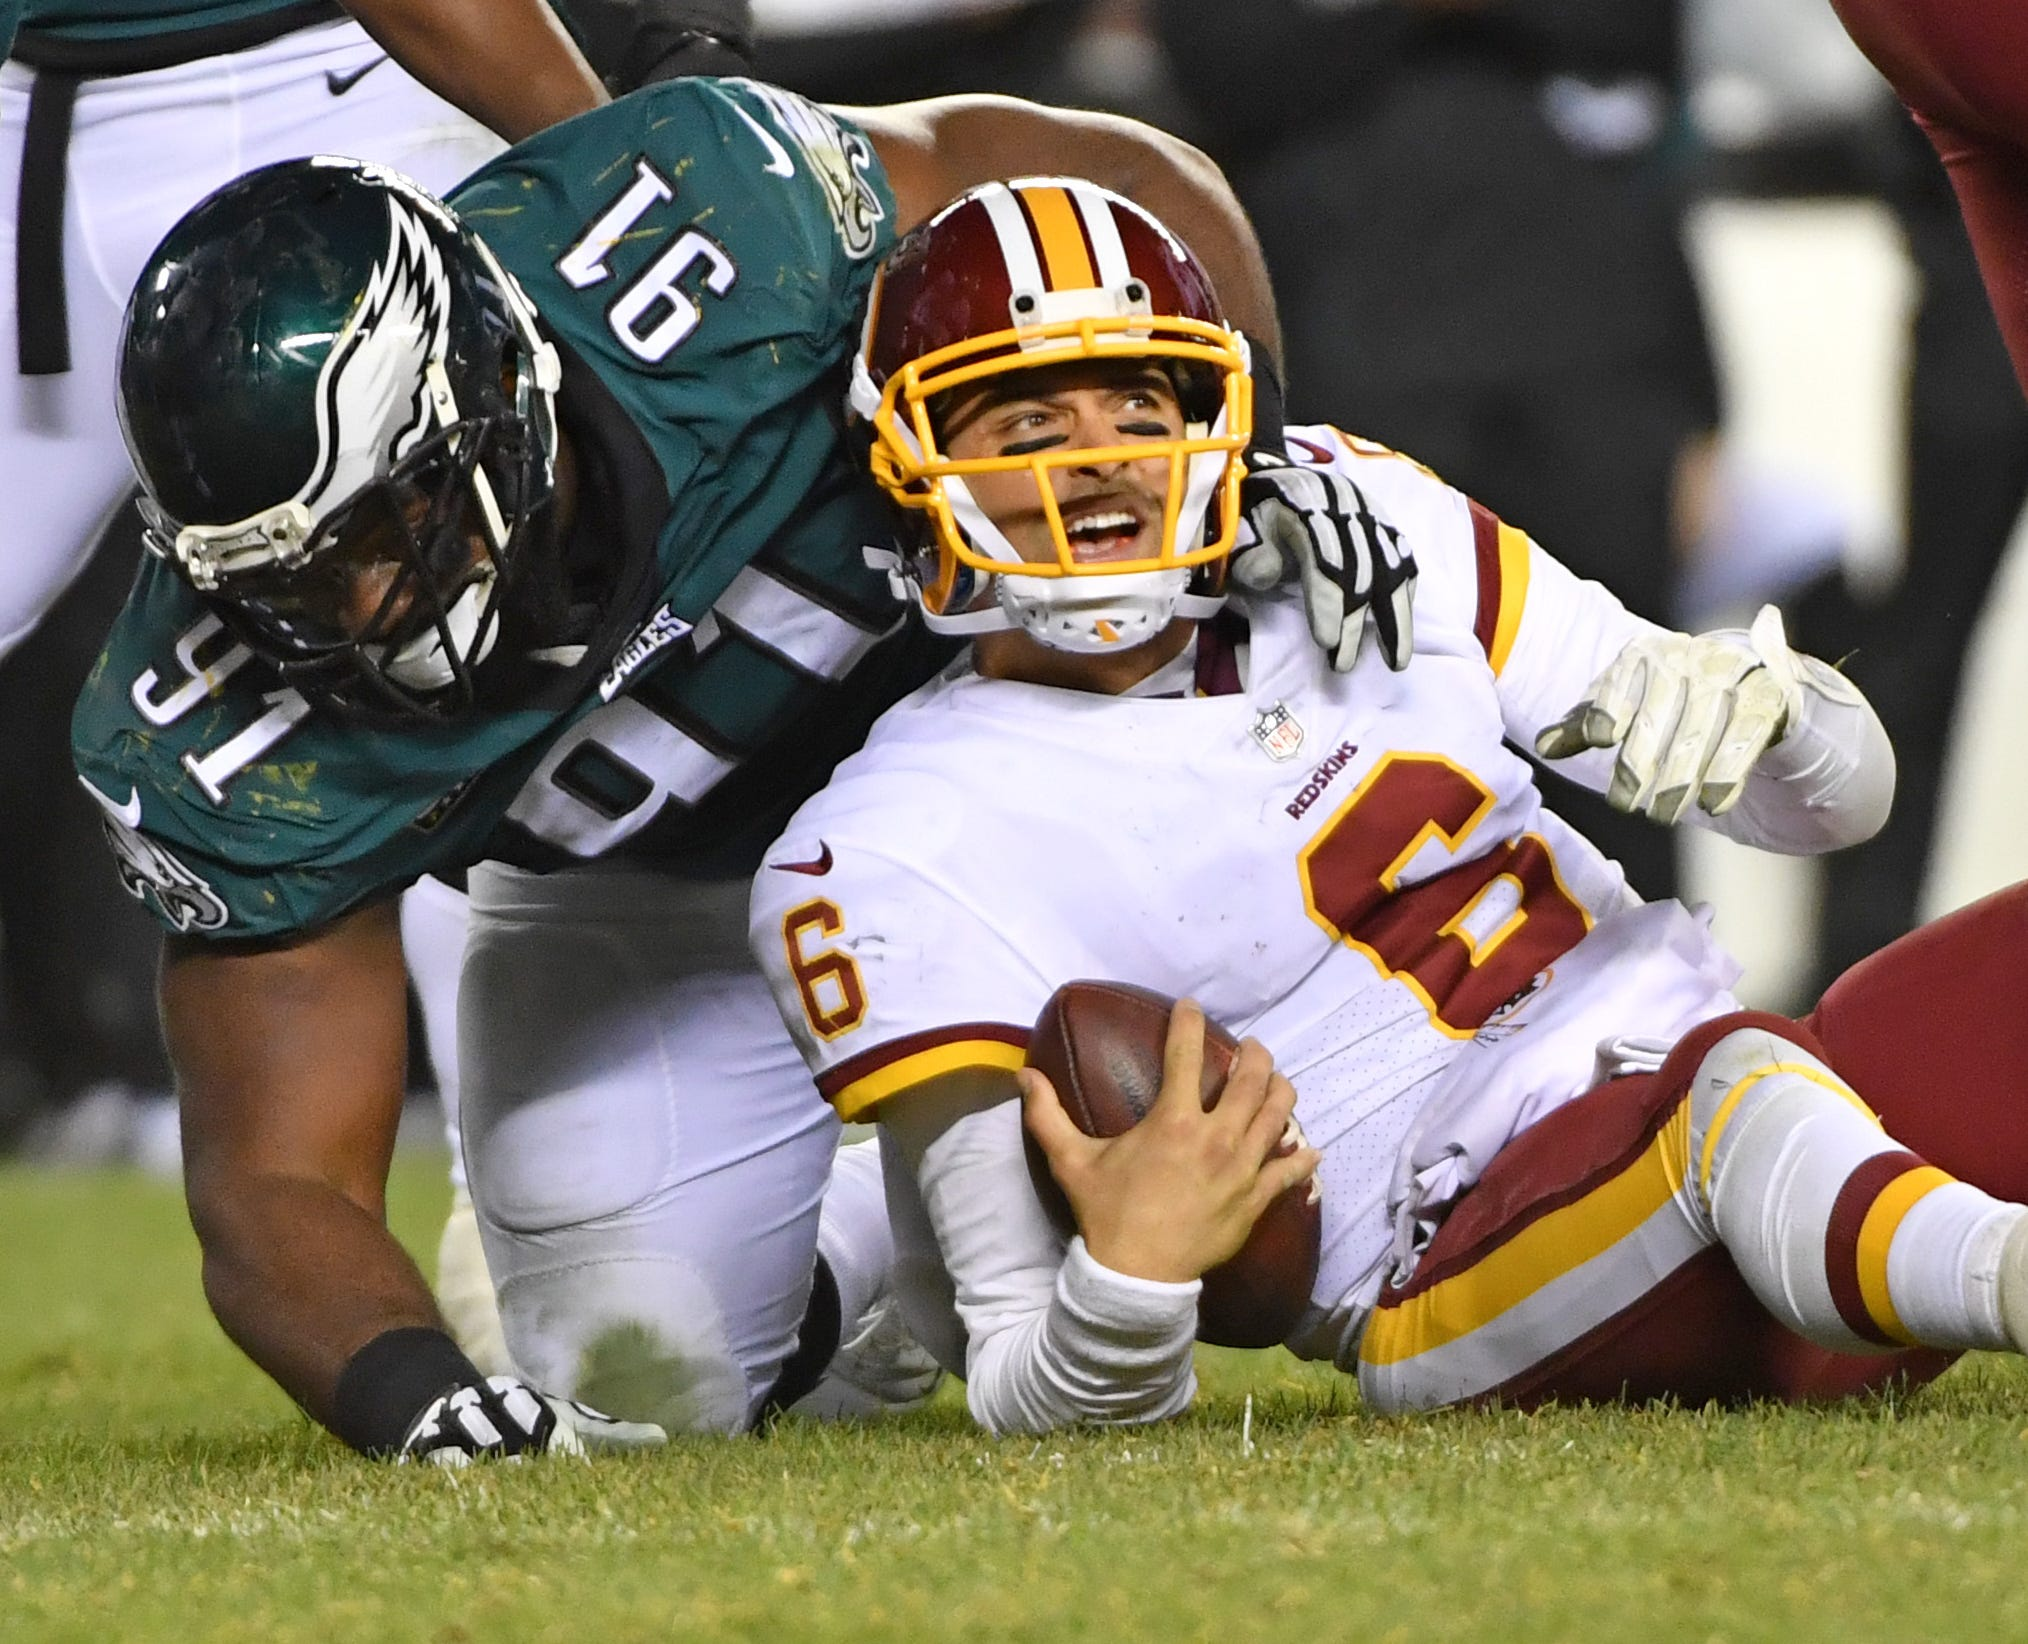 Philadelphia Eagles defensive tackle Fletcher Cox (91) sacks Washington Redskins quarterback Mark Sanchez (6) during the fourth quarter at Lincoln Financial Field.